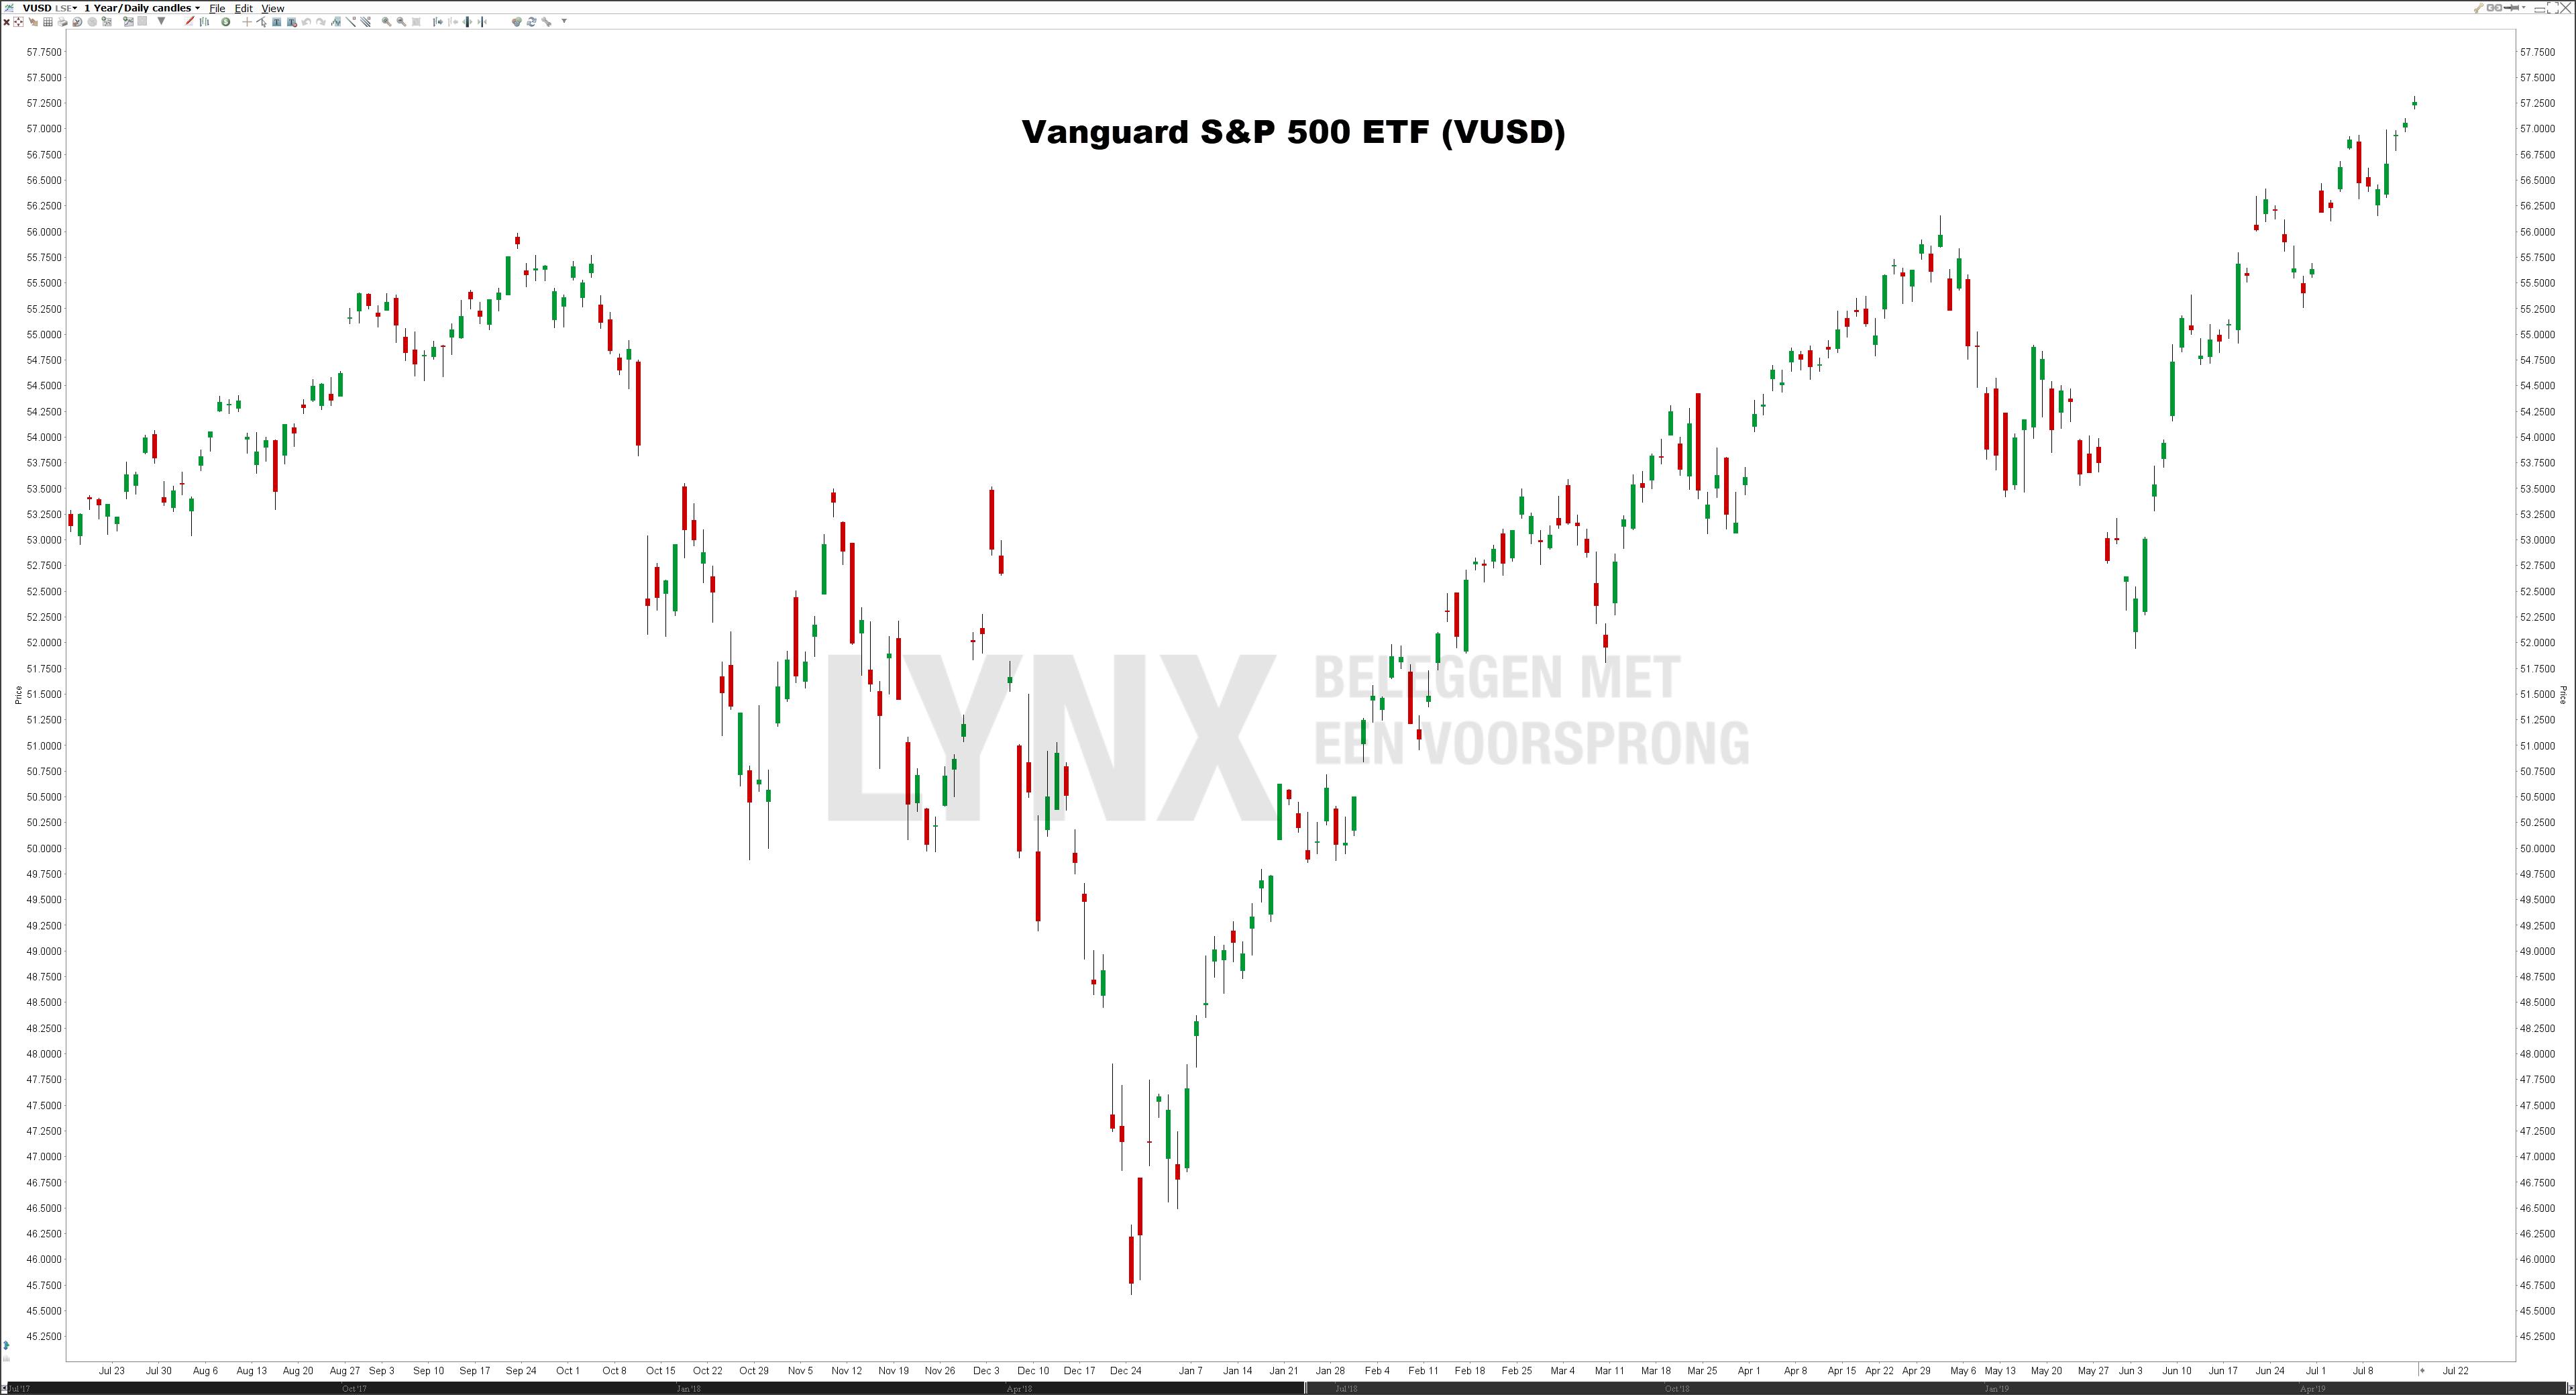 Vanguard S&P 500 ETFs (VUSD) - Beste S&P 500 ETFs